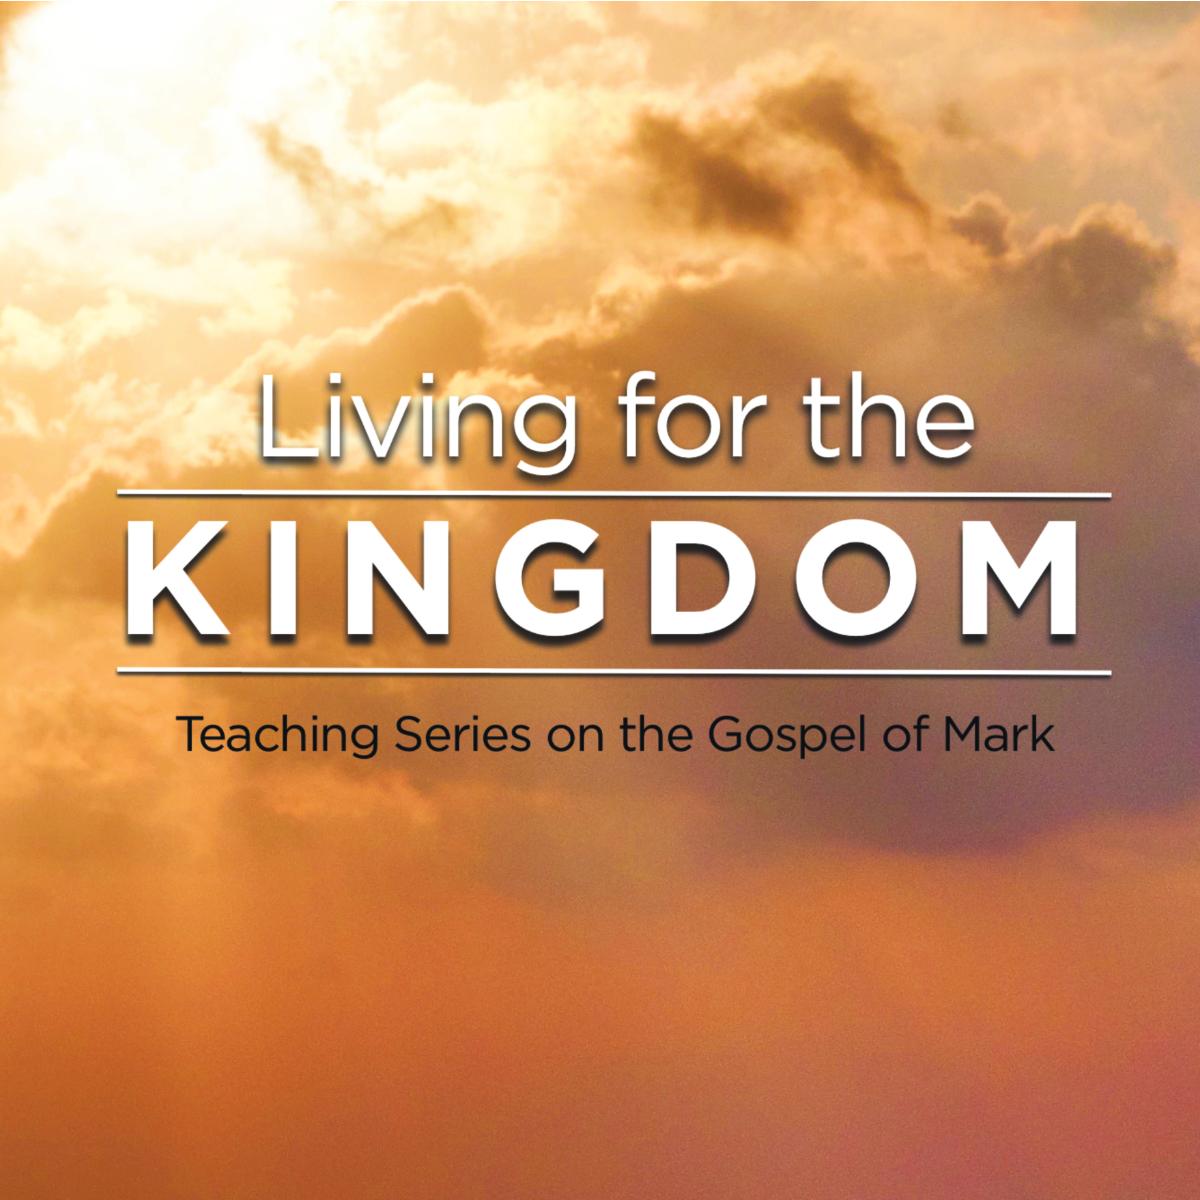 Living for the Kingdom 022019.jpg